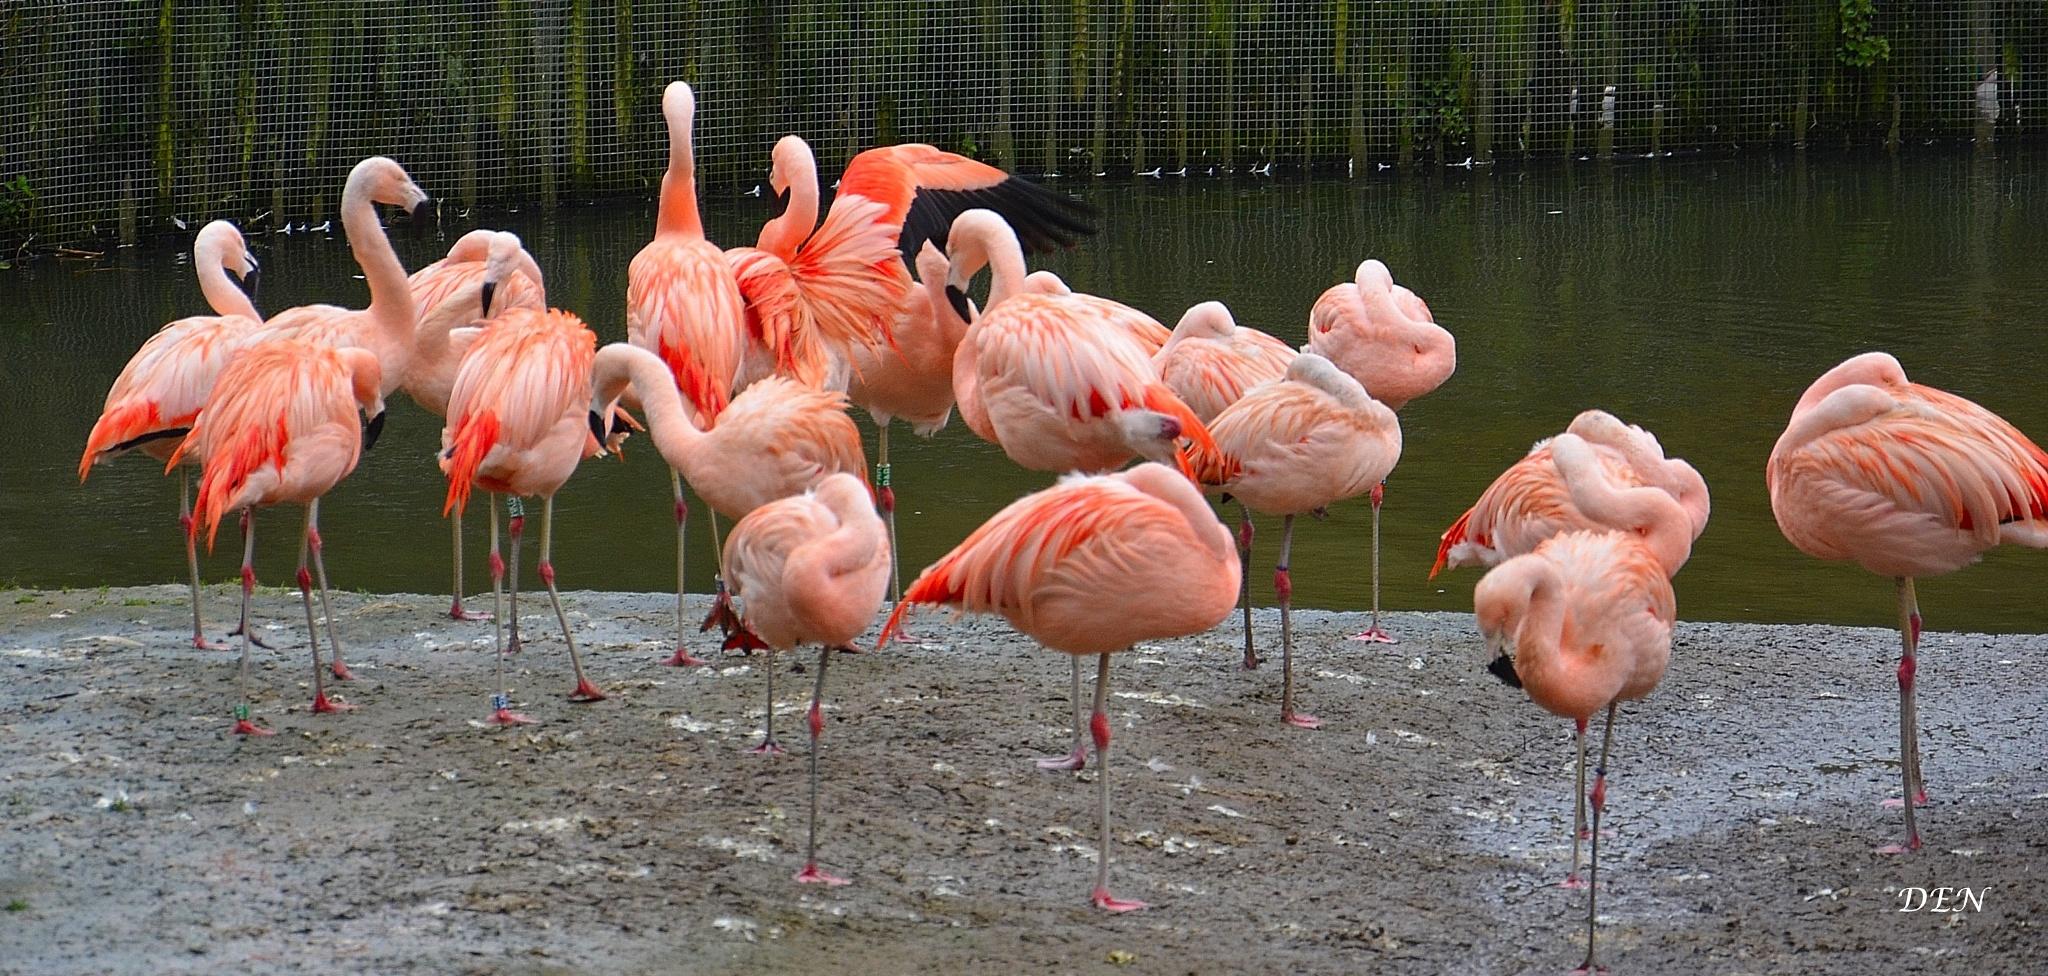 Pretty Flamingo by Denis_Bond